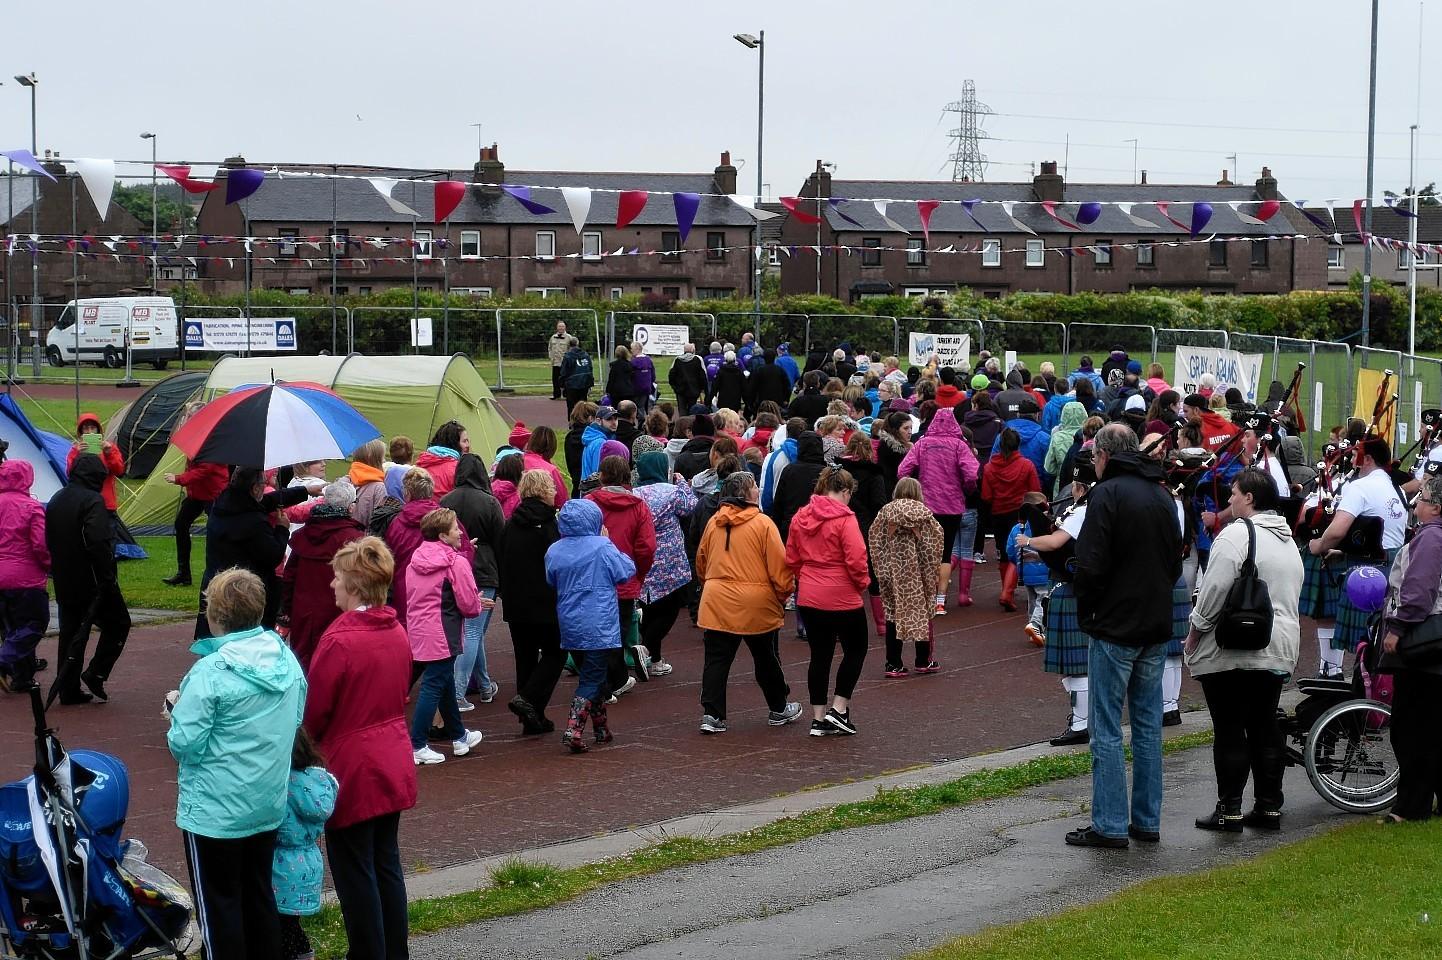 The 24-hour marathon event raises about £200,000 each year